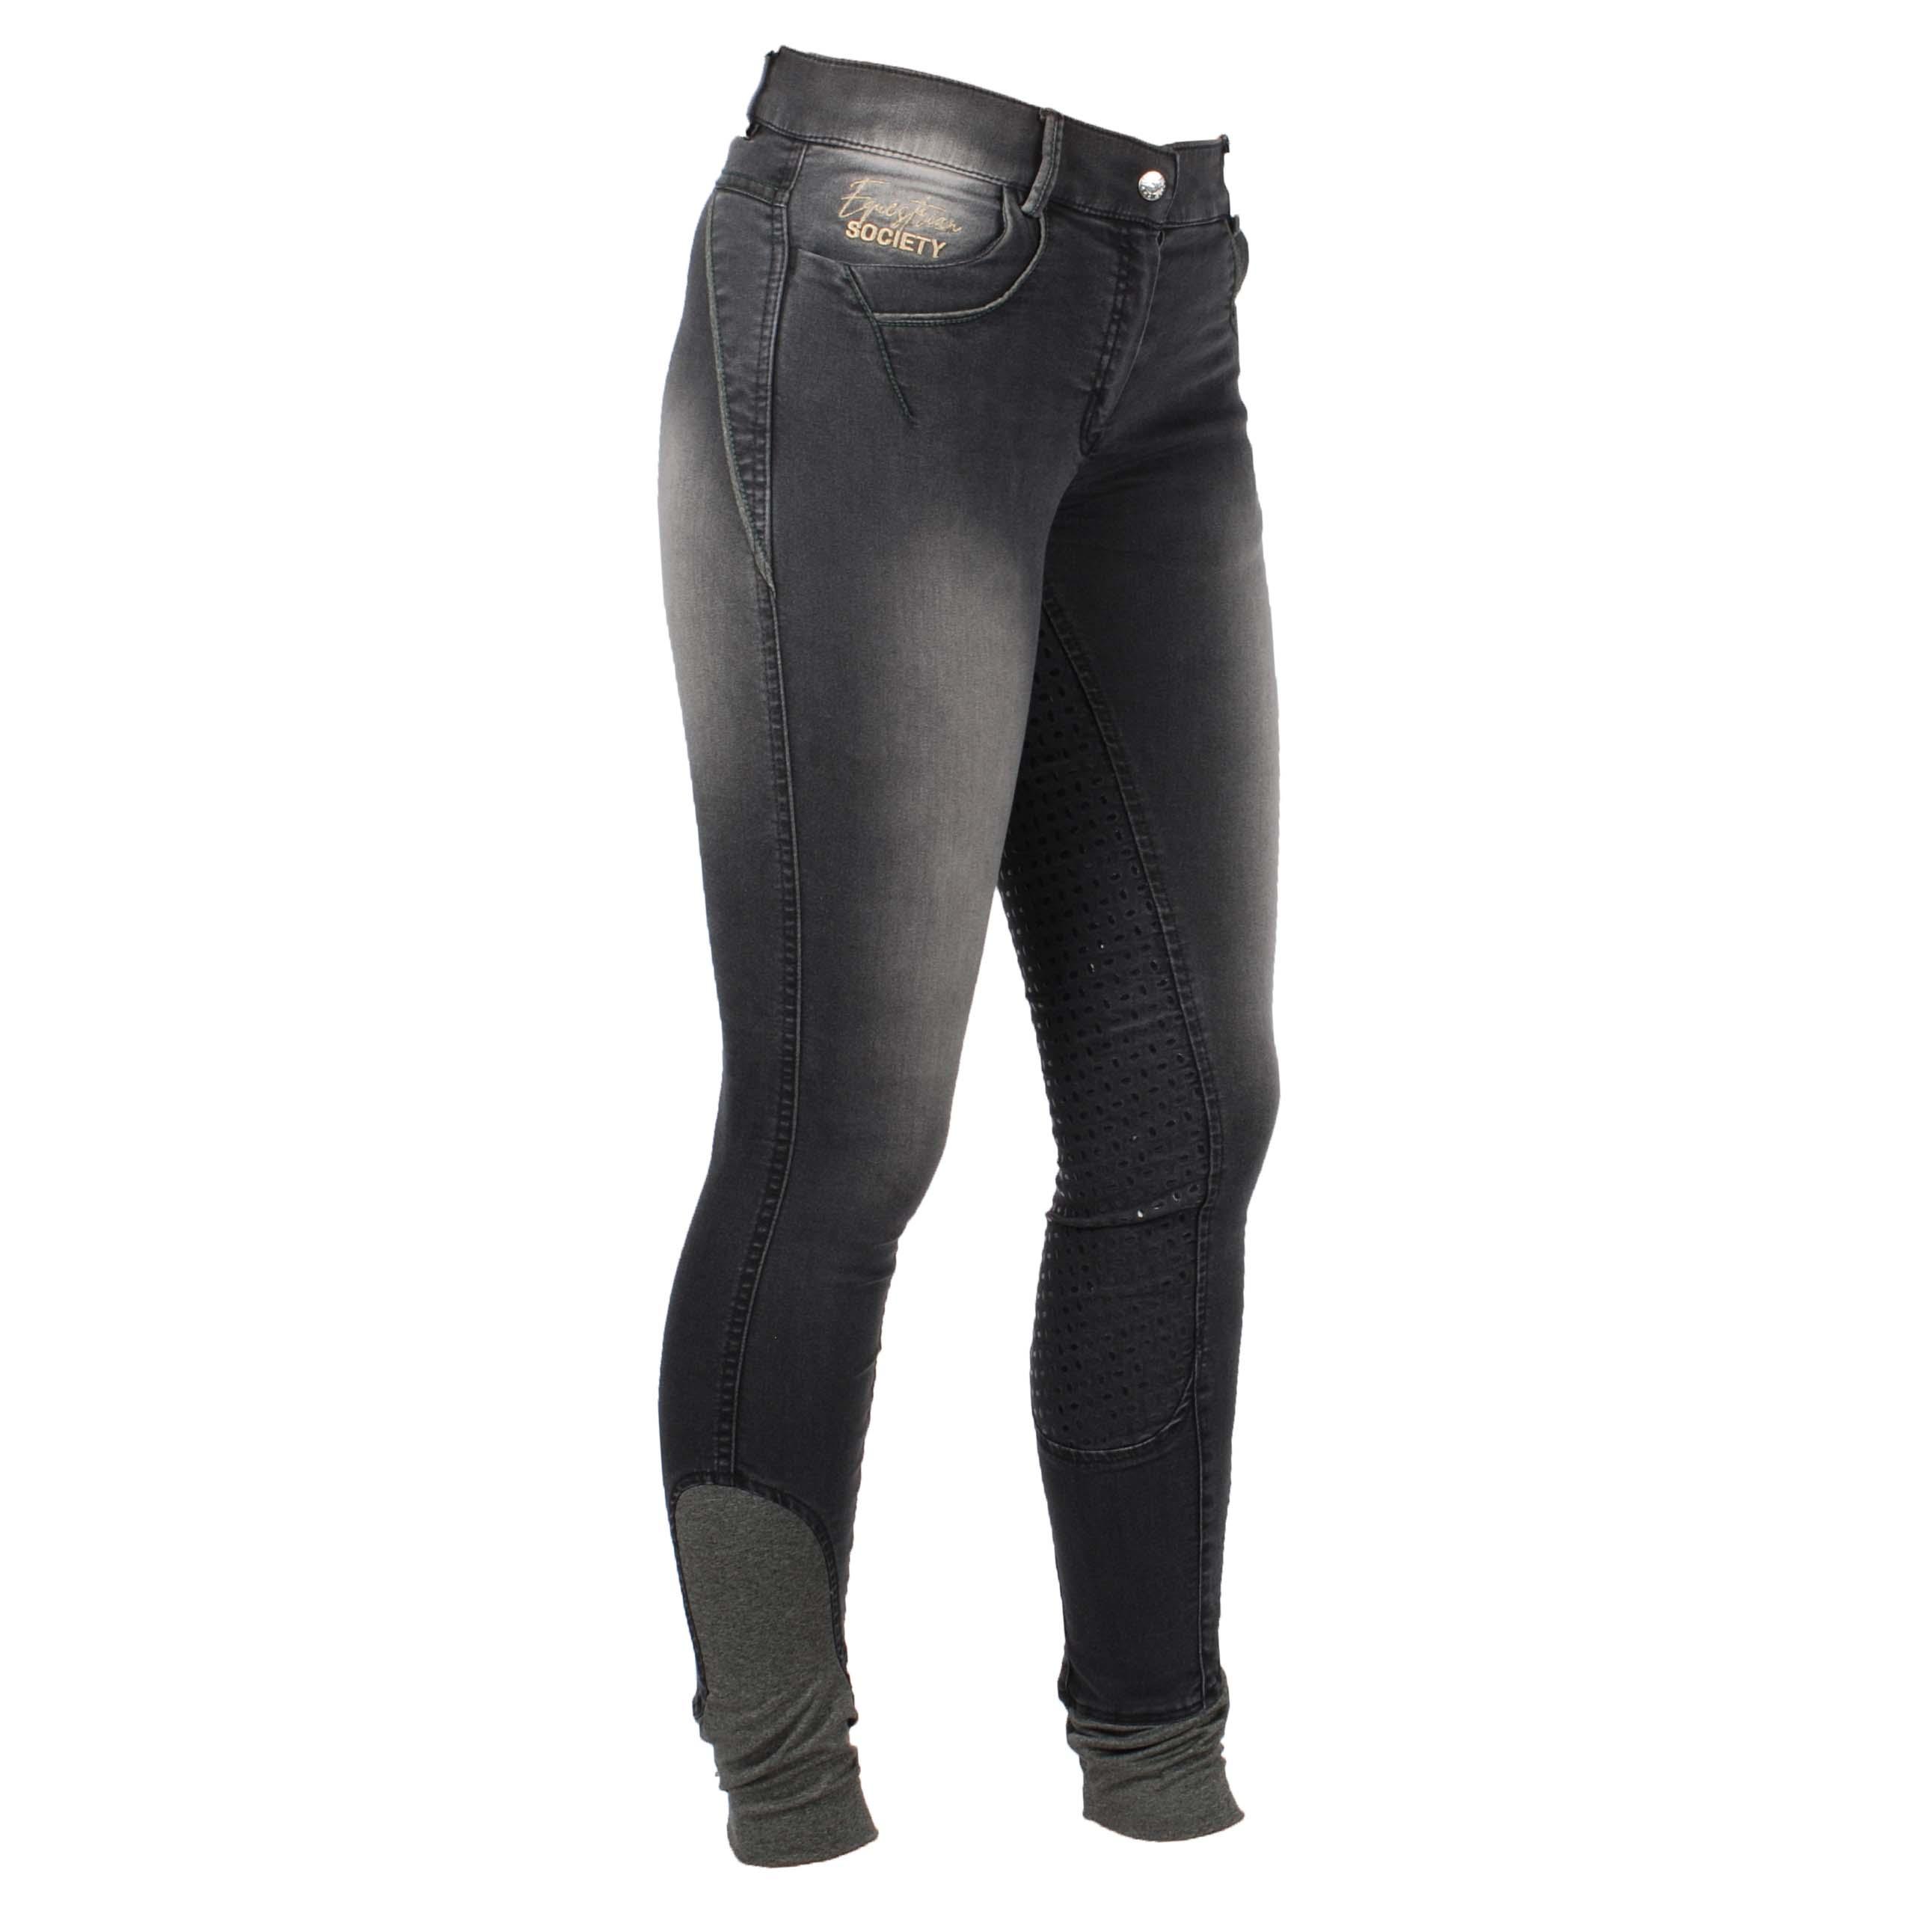 Harrys Horse Greyton FG jeans rijbroek zwart maat:44